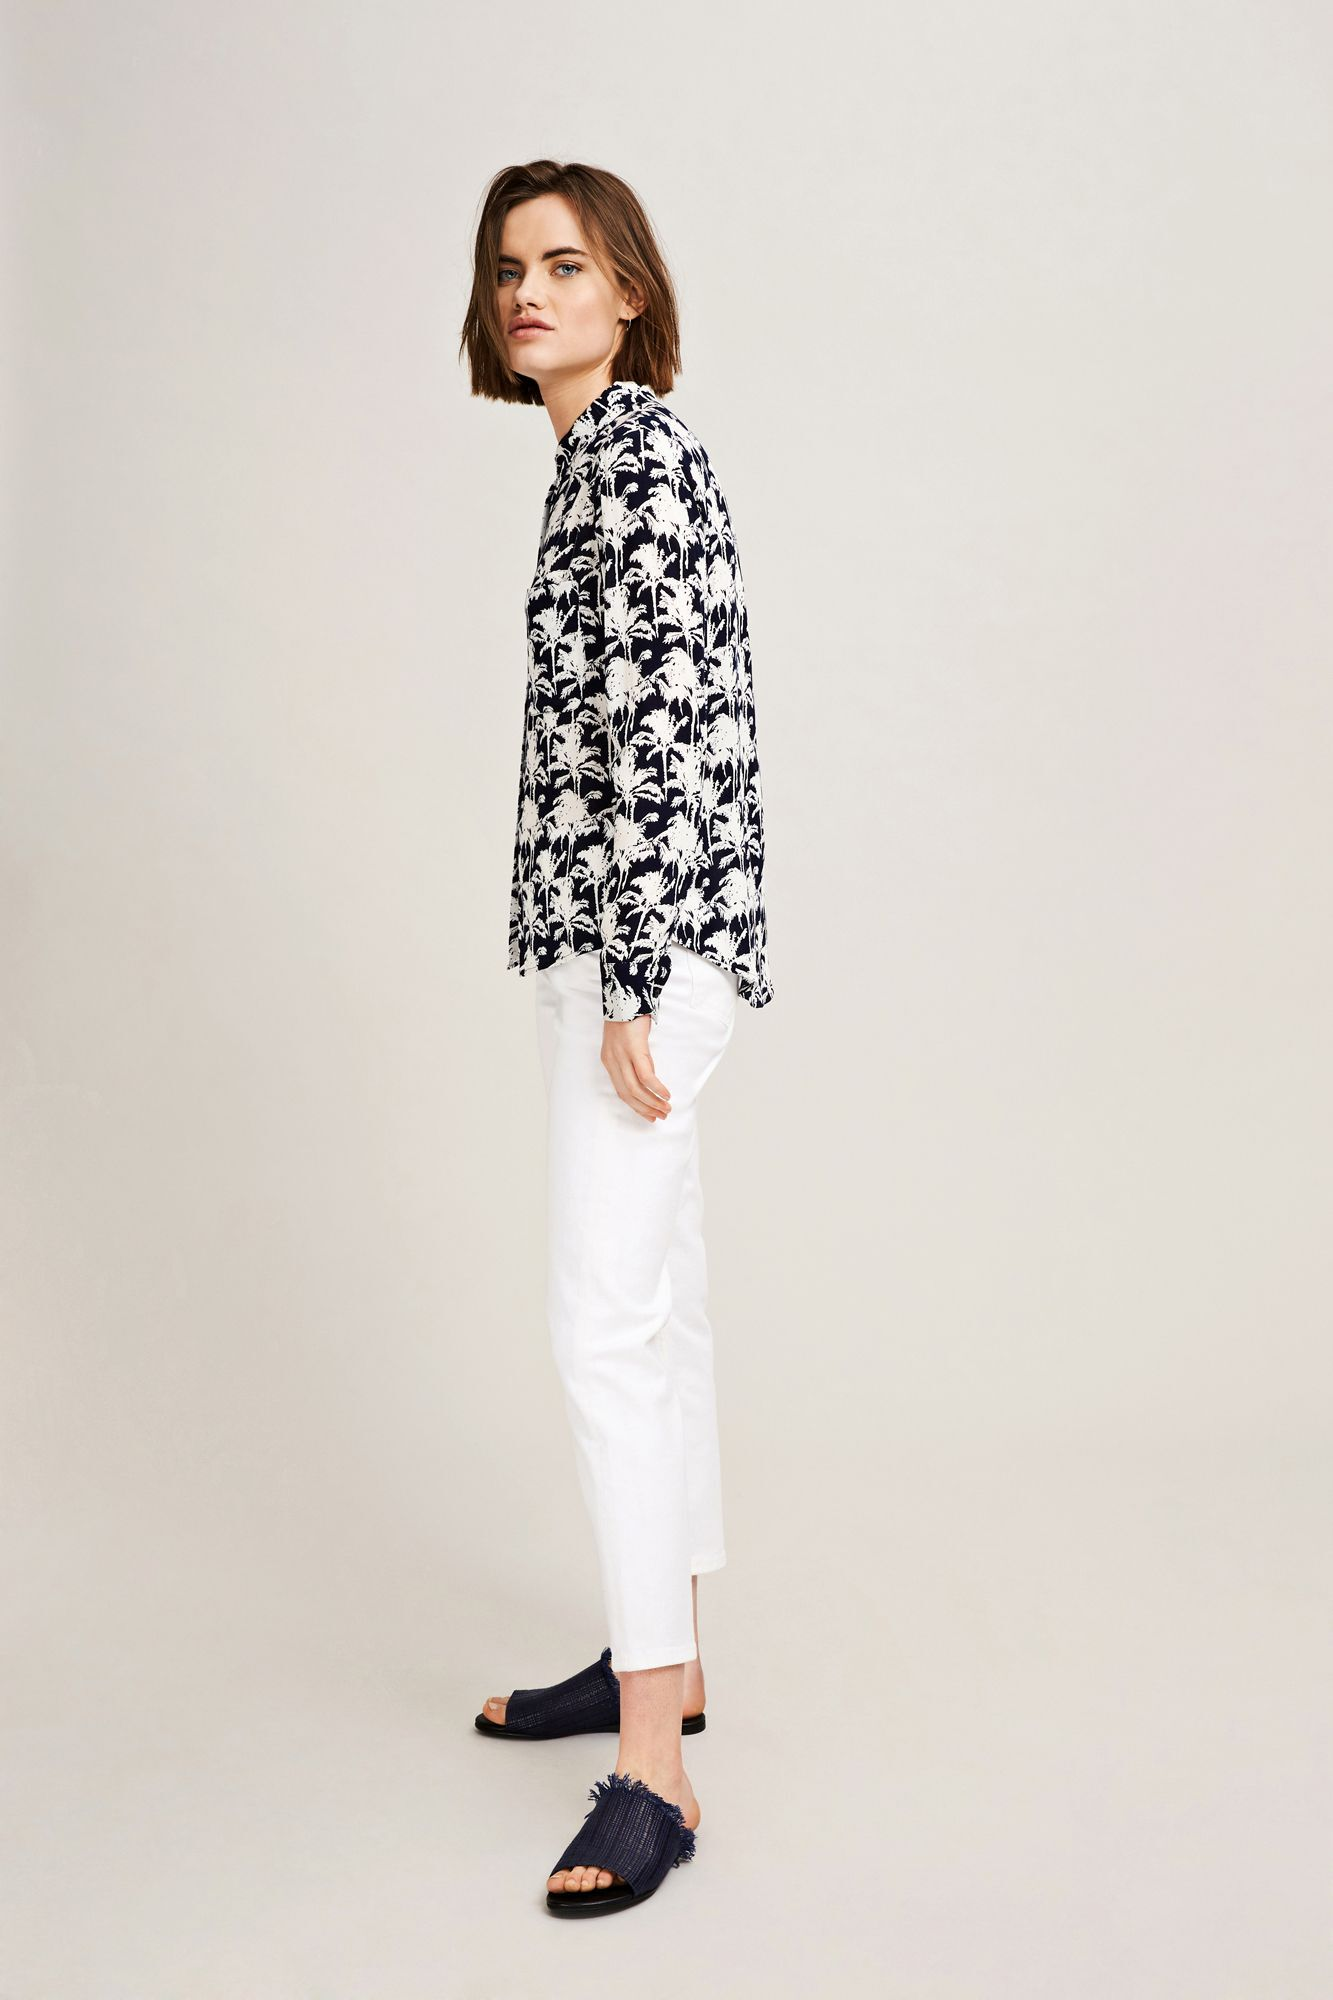 Milly shirt aop 7201, BLEU PALMIER